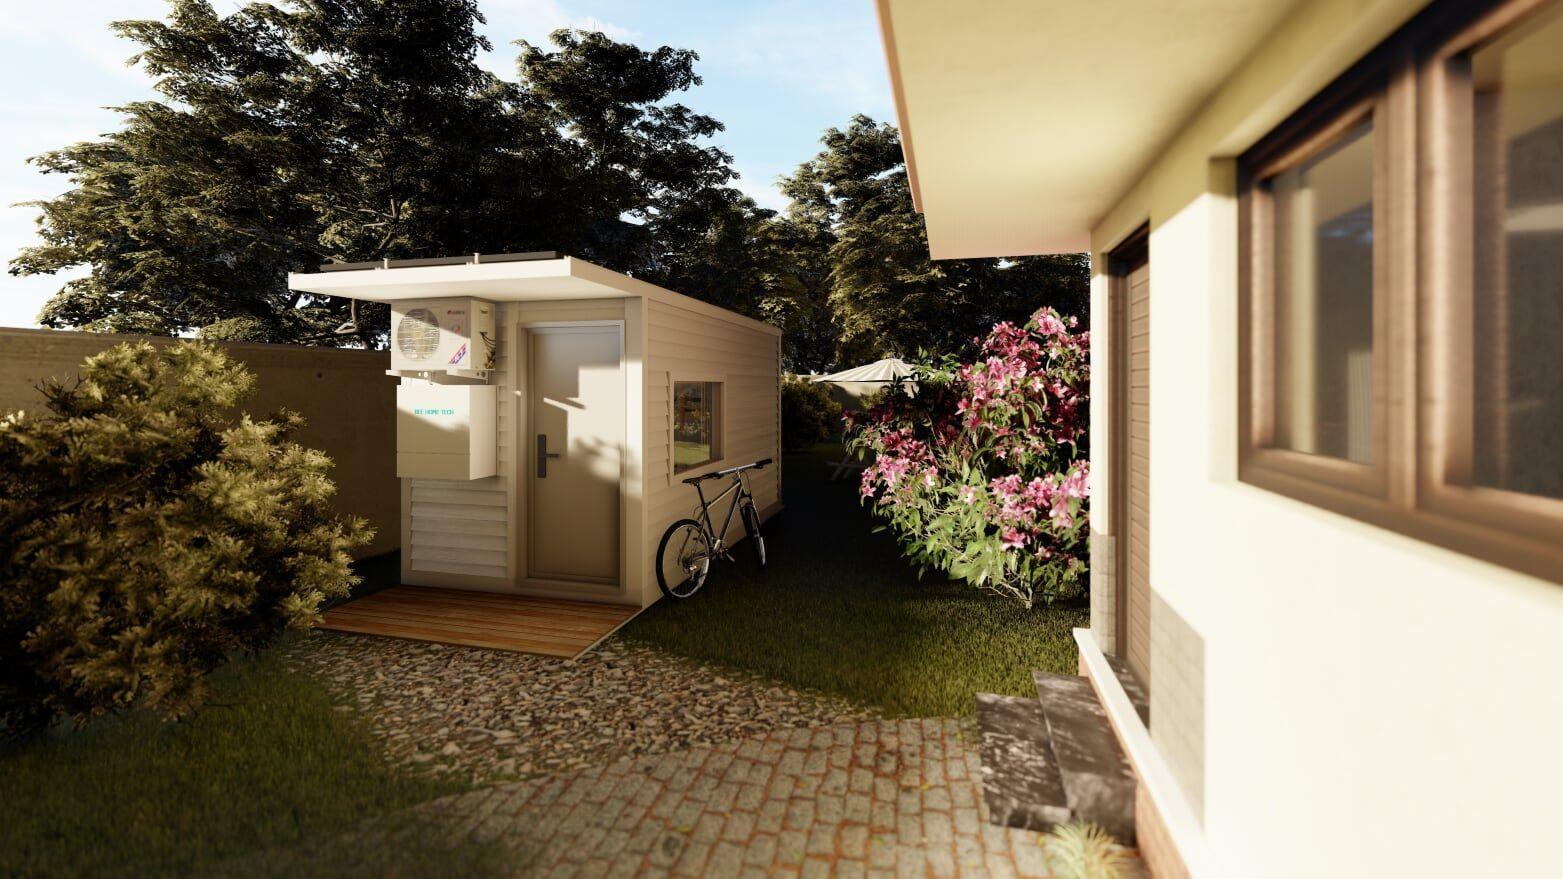 876a2ba4b1a88eb7293ecf6e02bf9910 - The Natural Gardener Company Tiny Homes